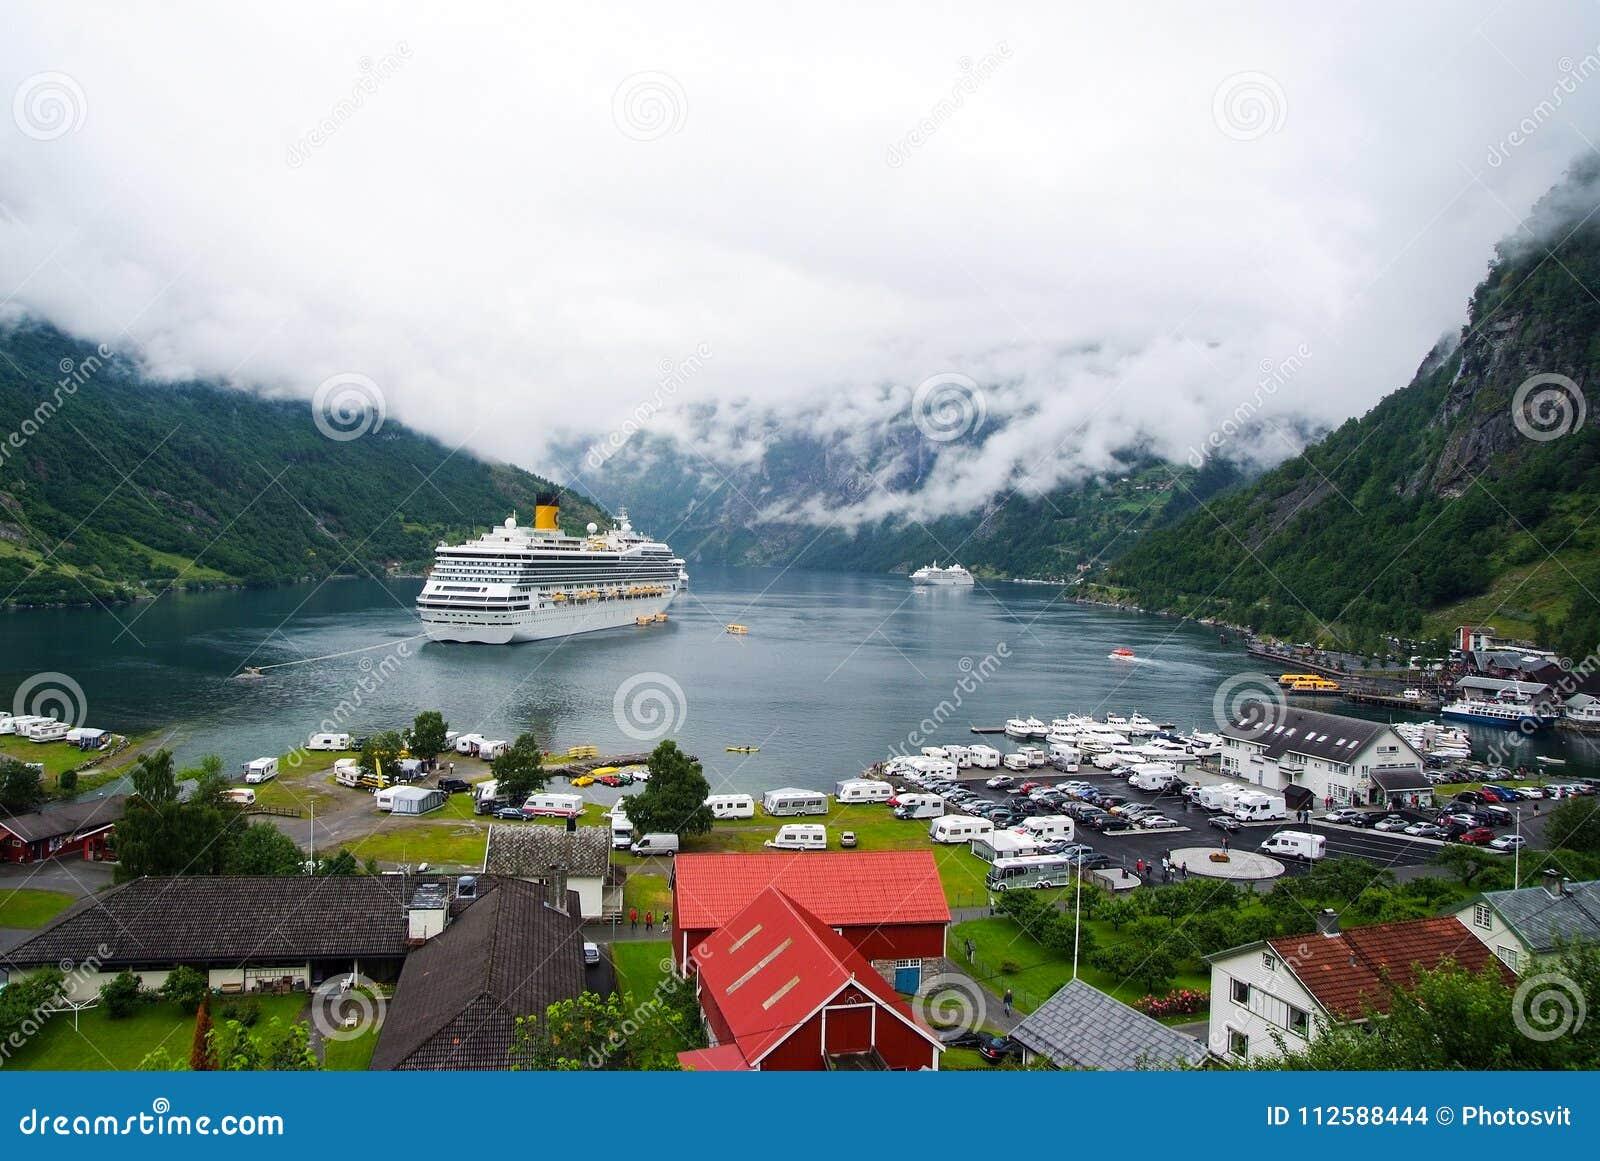 Geiranger Norge - Januari 25, 2010: skepp i den norska fjorden på molnig himmel Haveyeliner i byhamn Loppdestination, till